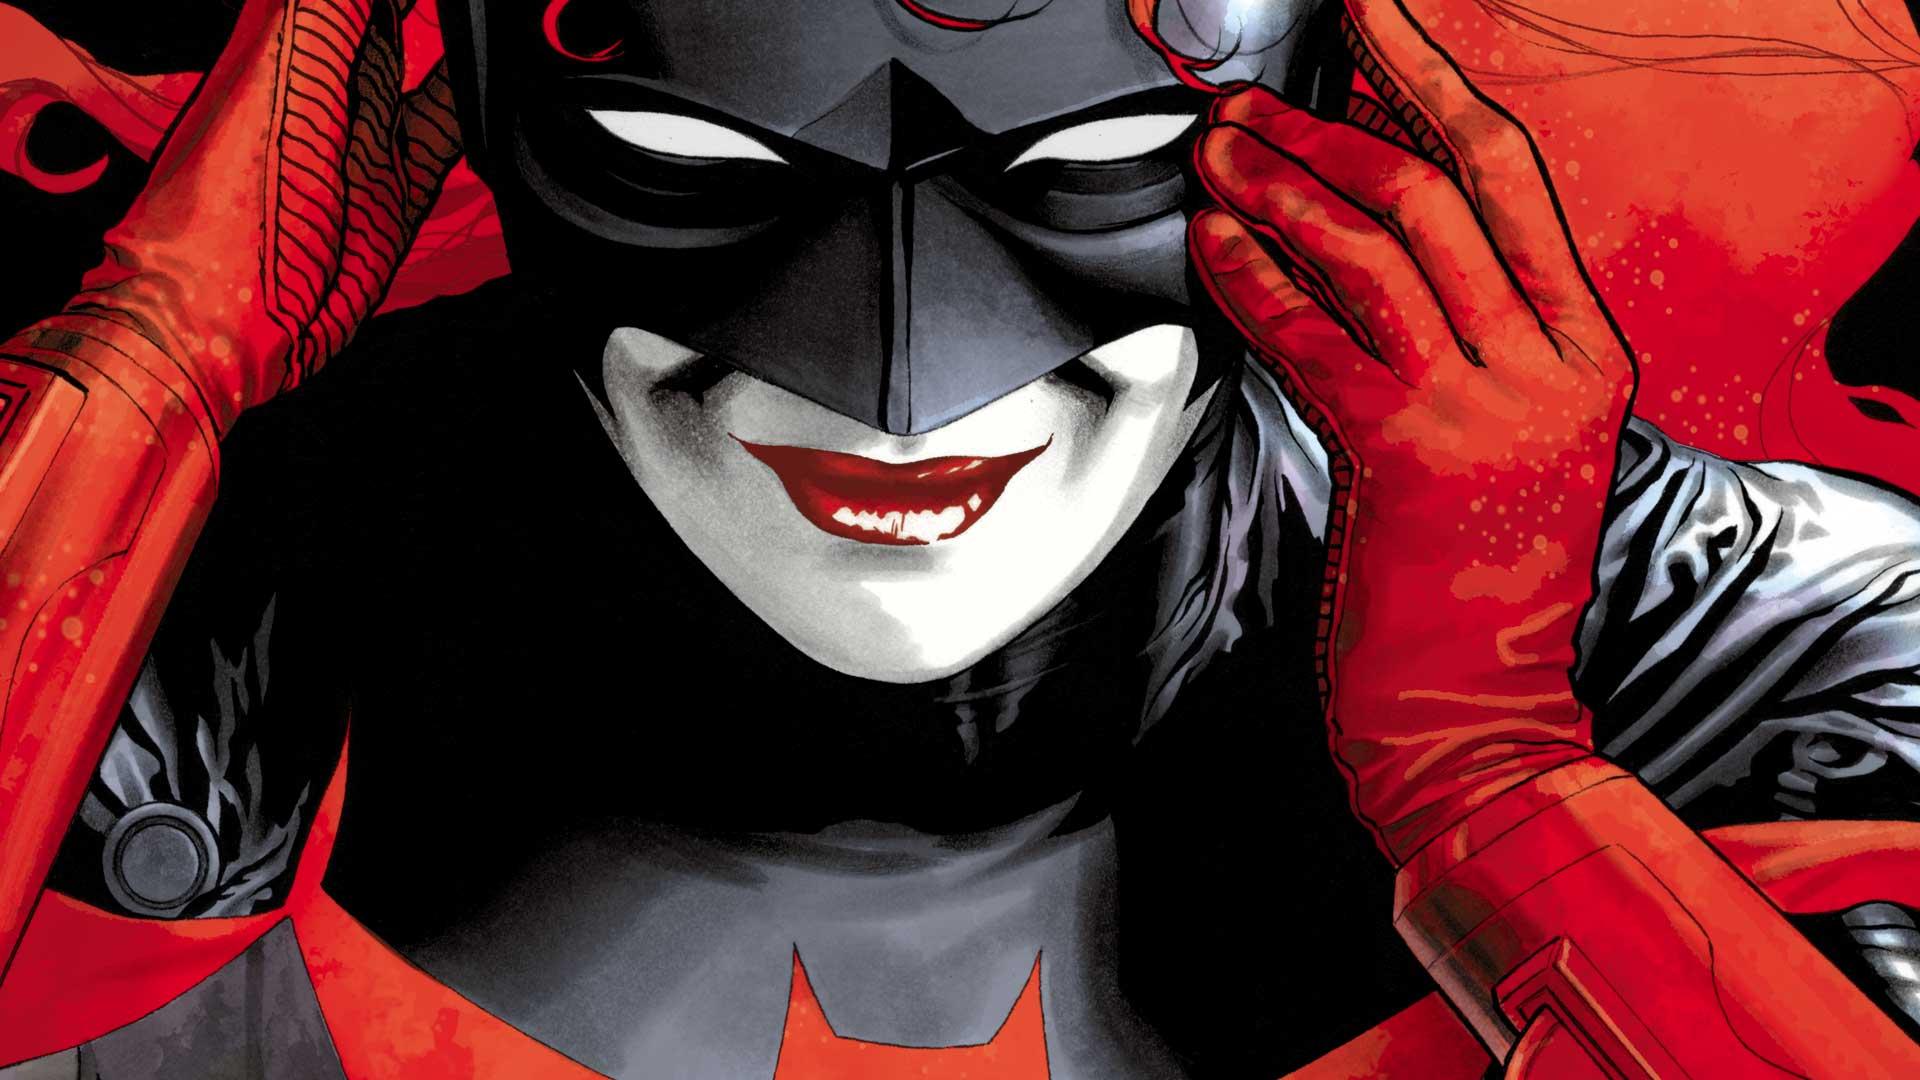 heres-what-ruby-rose-could-look-like-as-batwoman-social.jpg